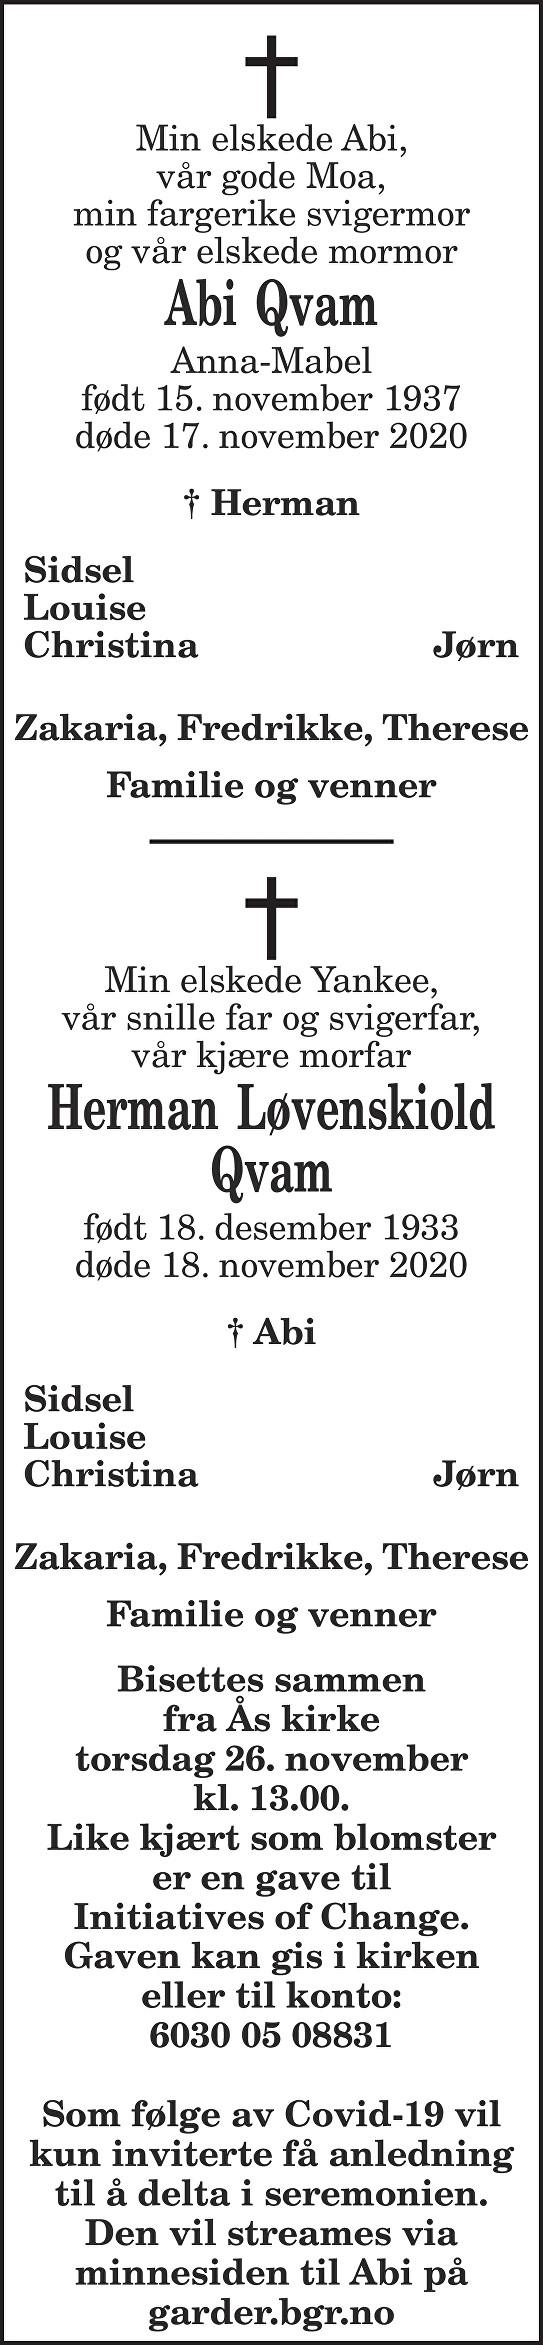 Anna-Mabel Qvam Dødsannonse